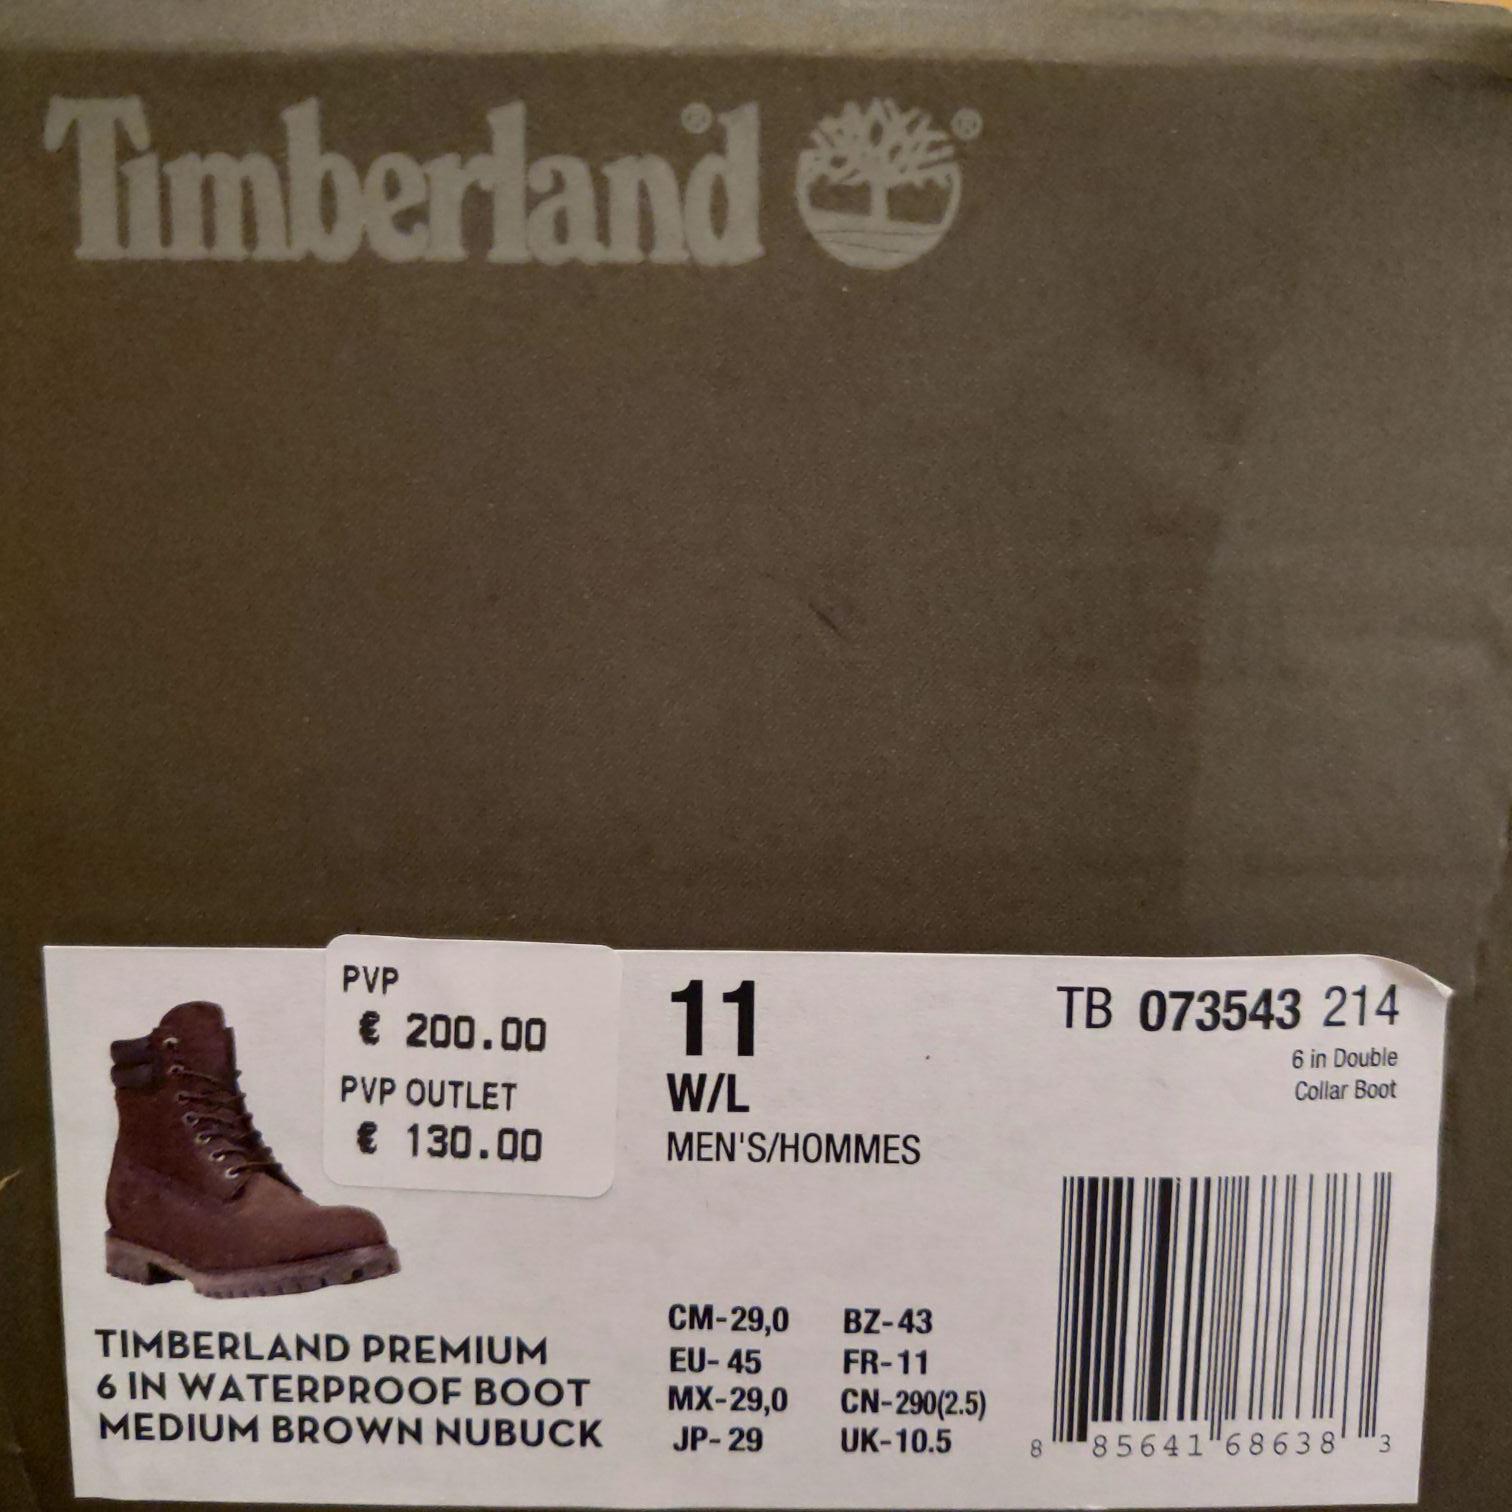 Timberland Premium 6 In doble collar